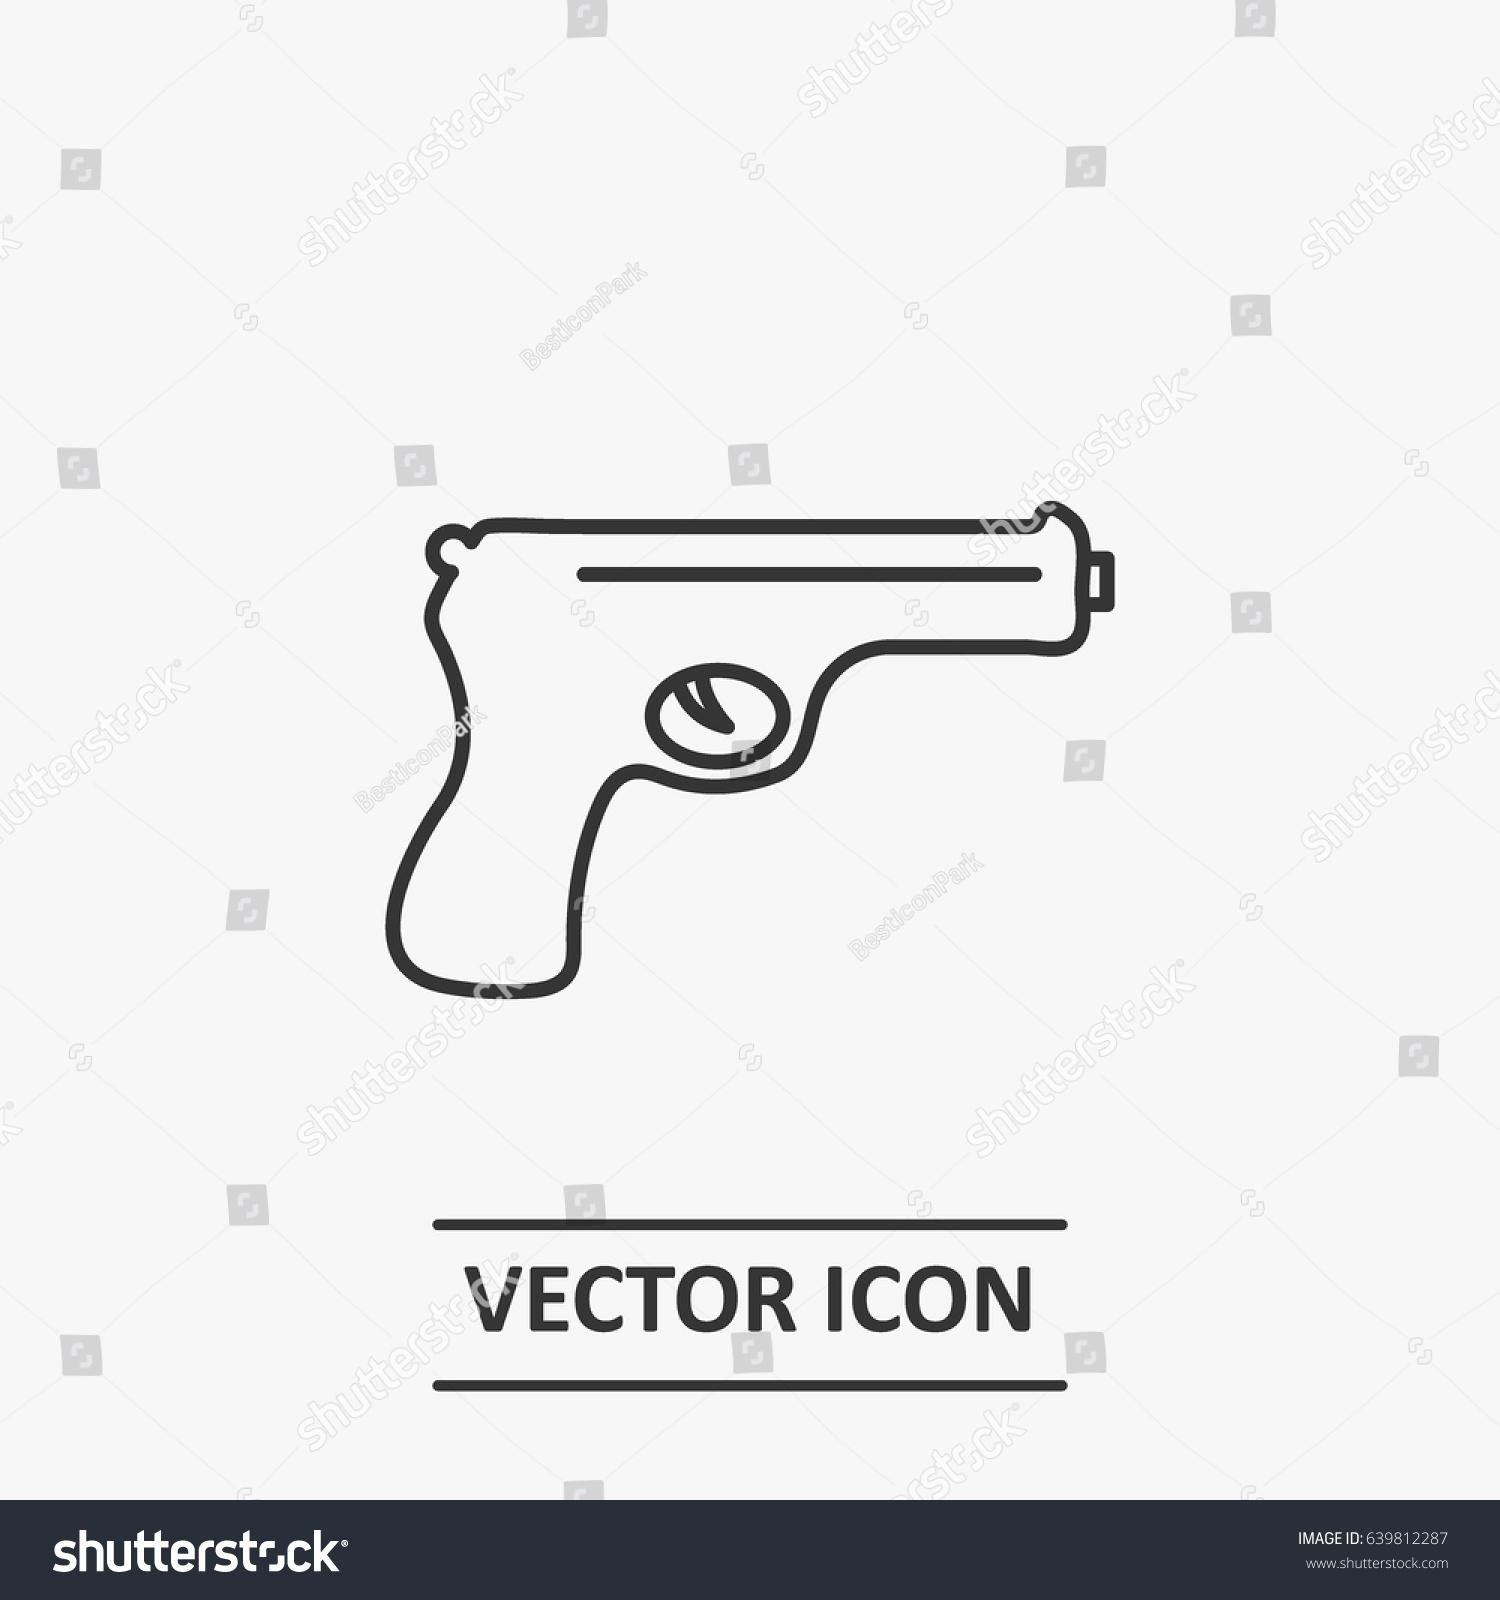 Outline pistol icon illustration vector symbol stock vector outline pistol icon illustration vector symbol buycottarizona